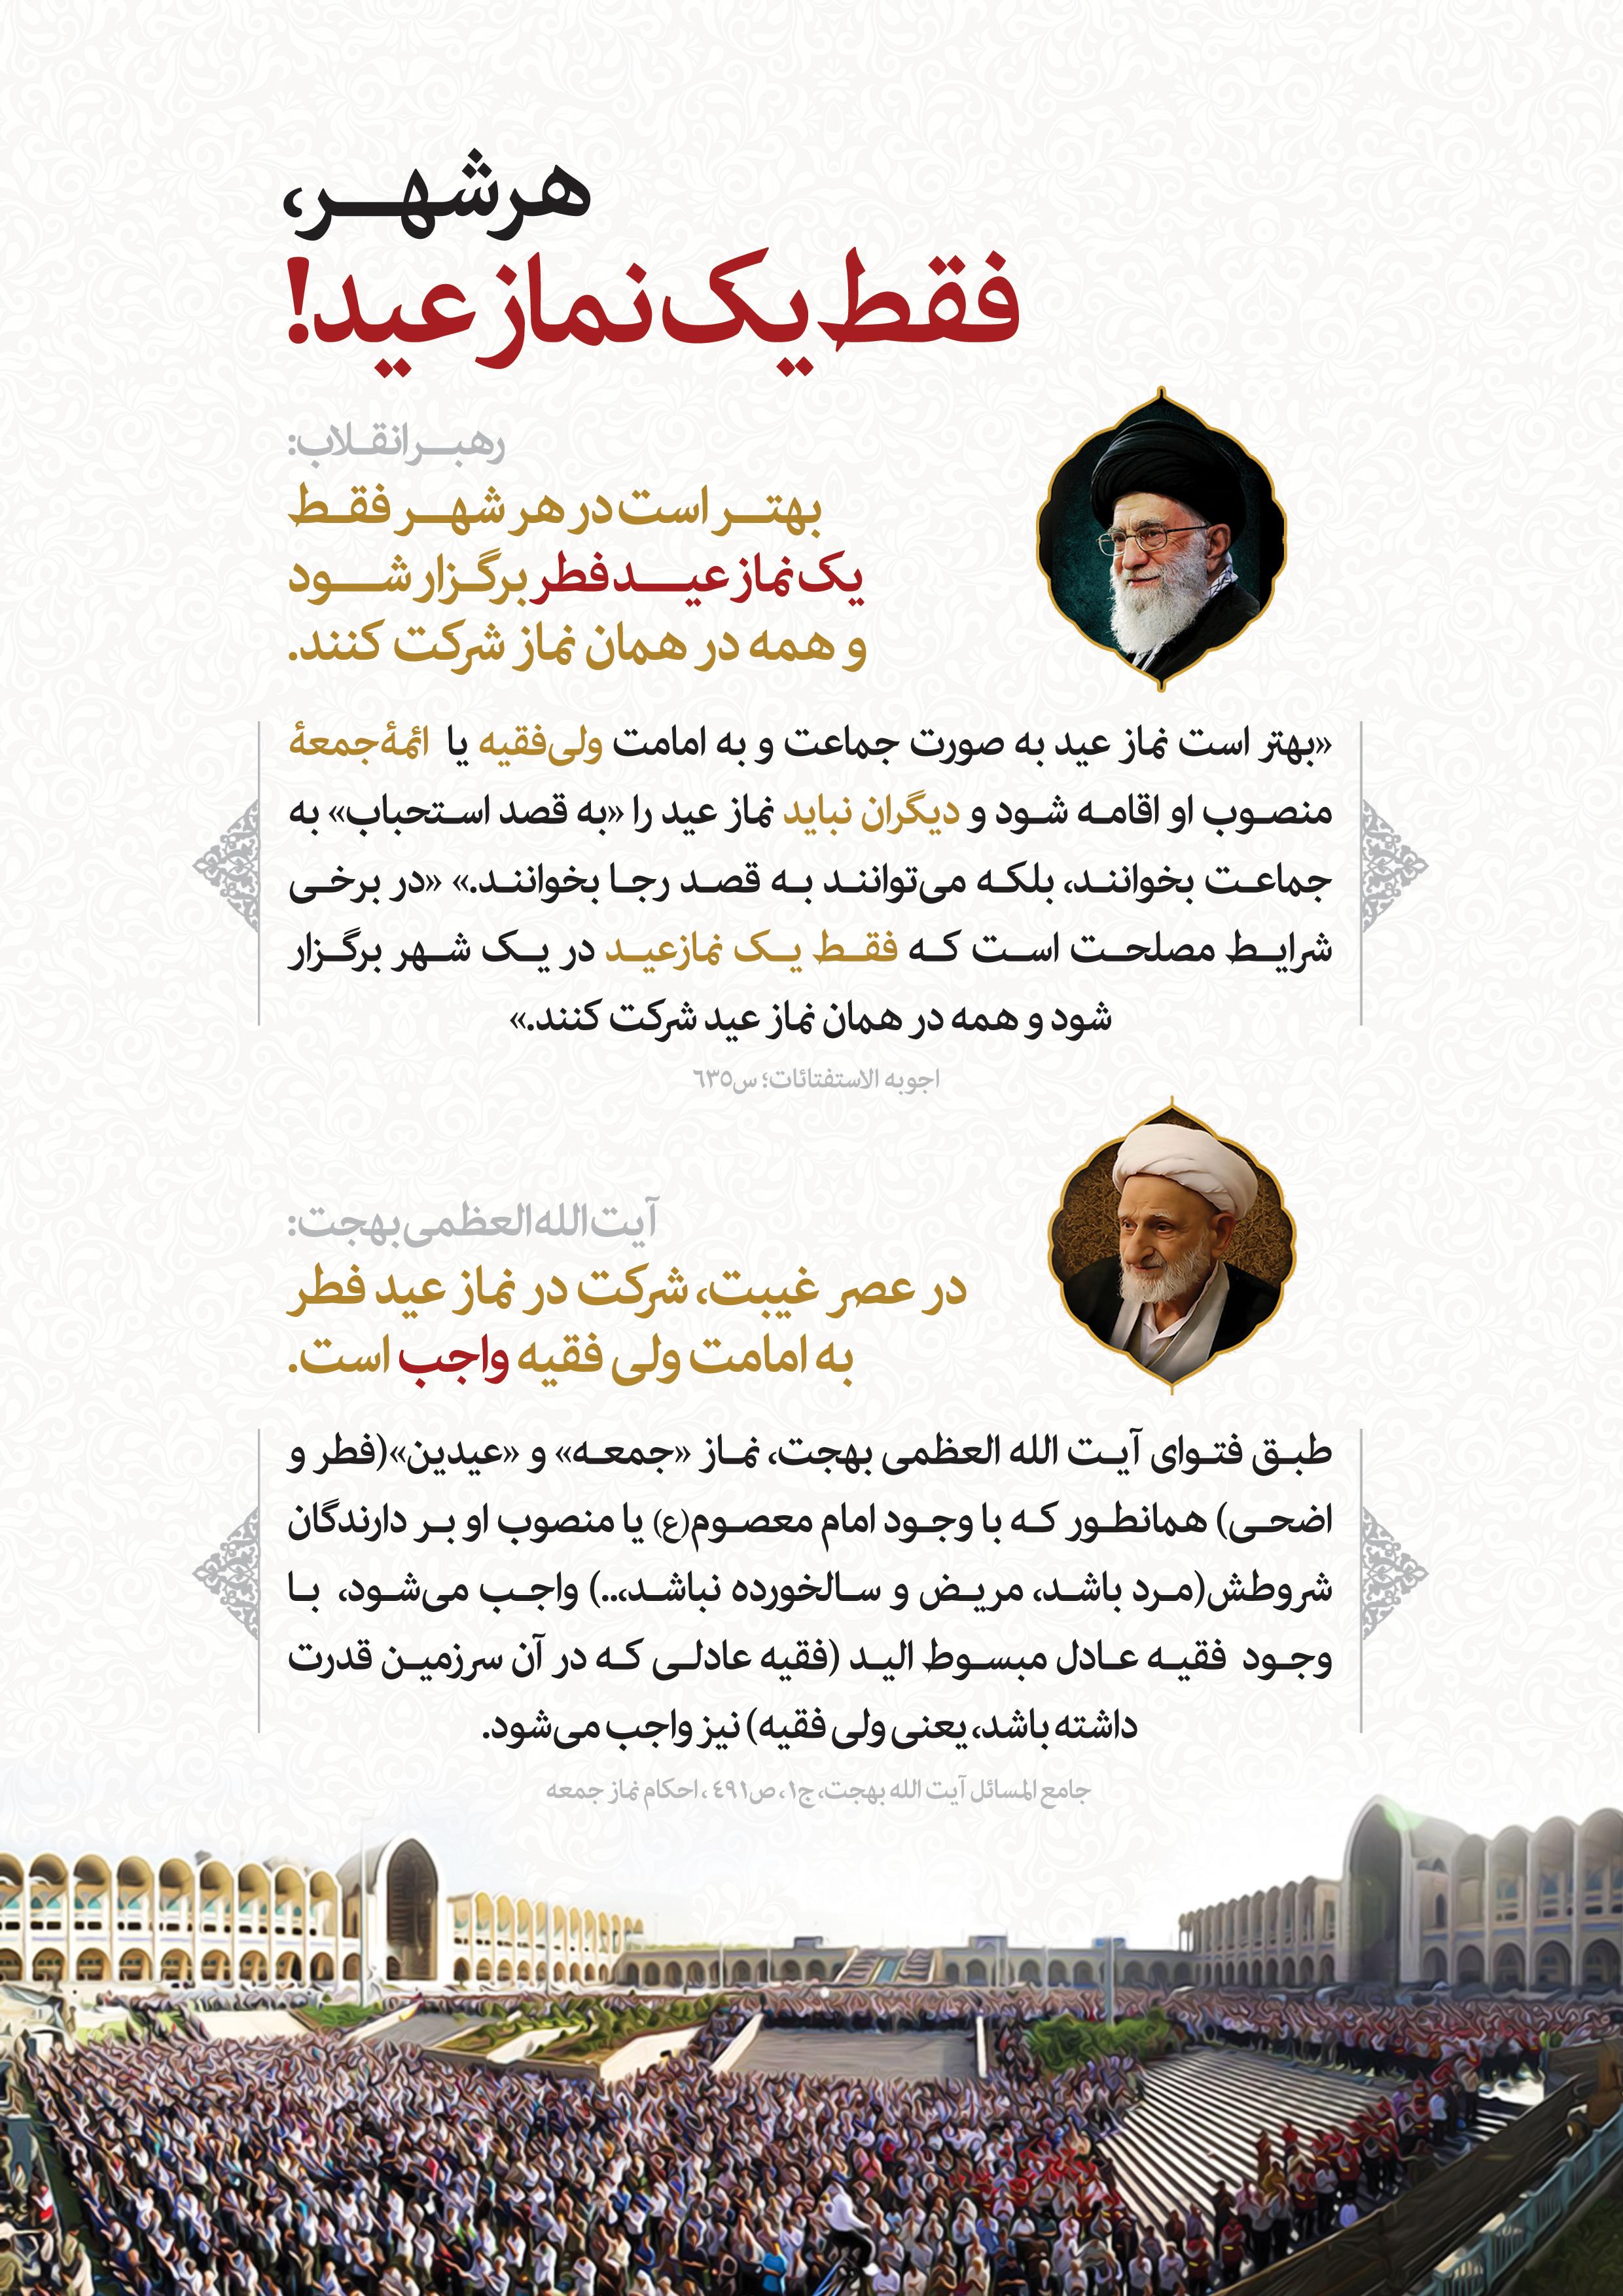 http://bayanbox.ir/view/6982686758039526475/Poster-HarShahrFaghatYekNamazEyd.jpg